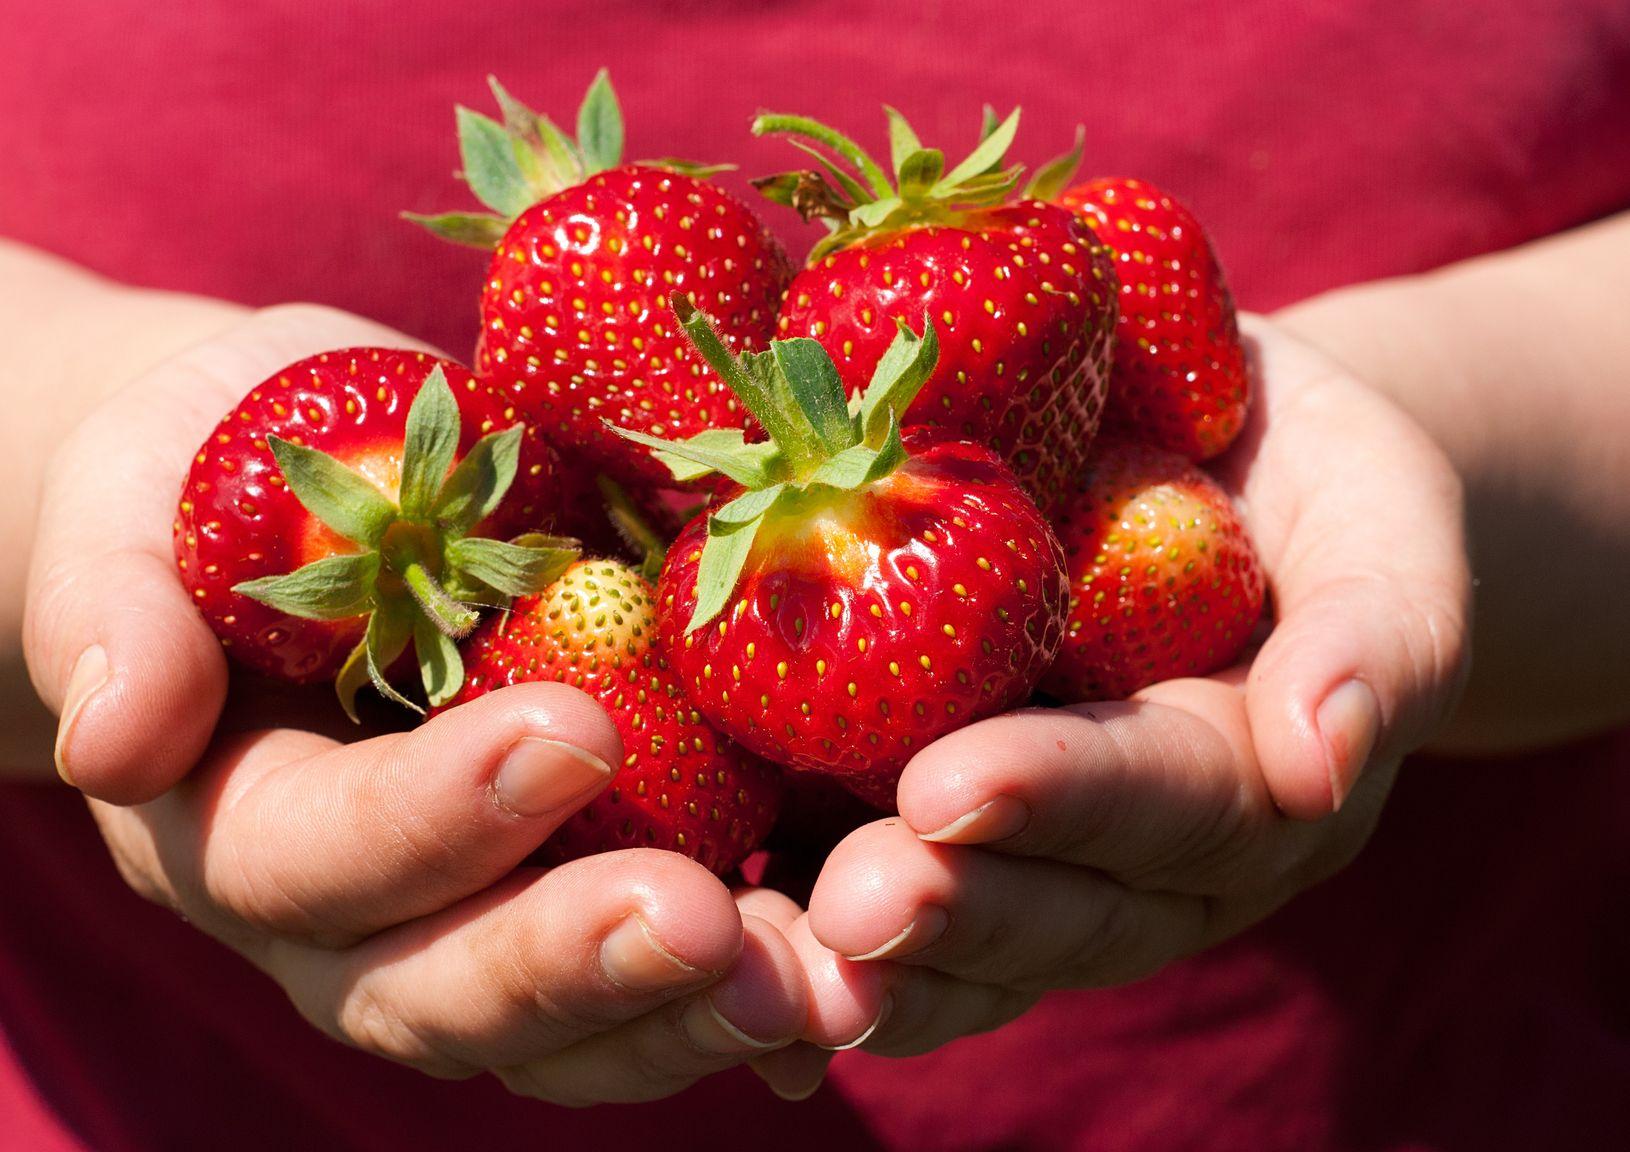 Handful of Strawberries. https://www.info-on-high-blood-pressure.com/Potassium-High-Blood-Pressure.html